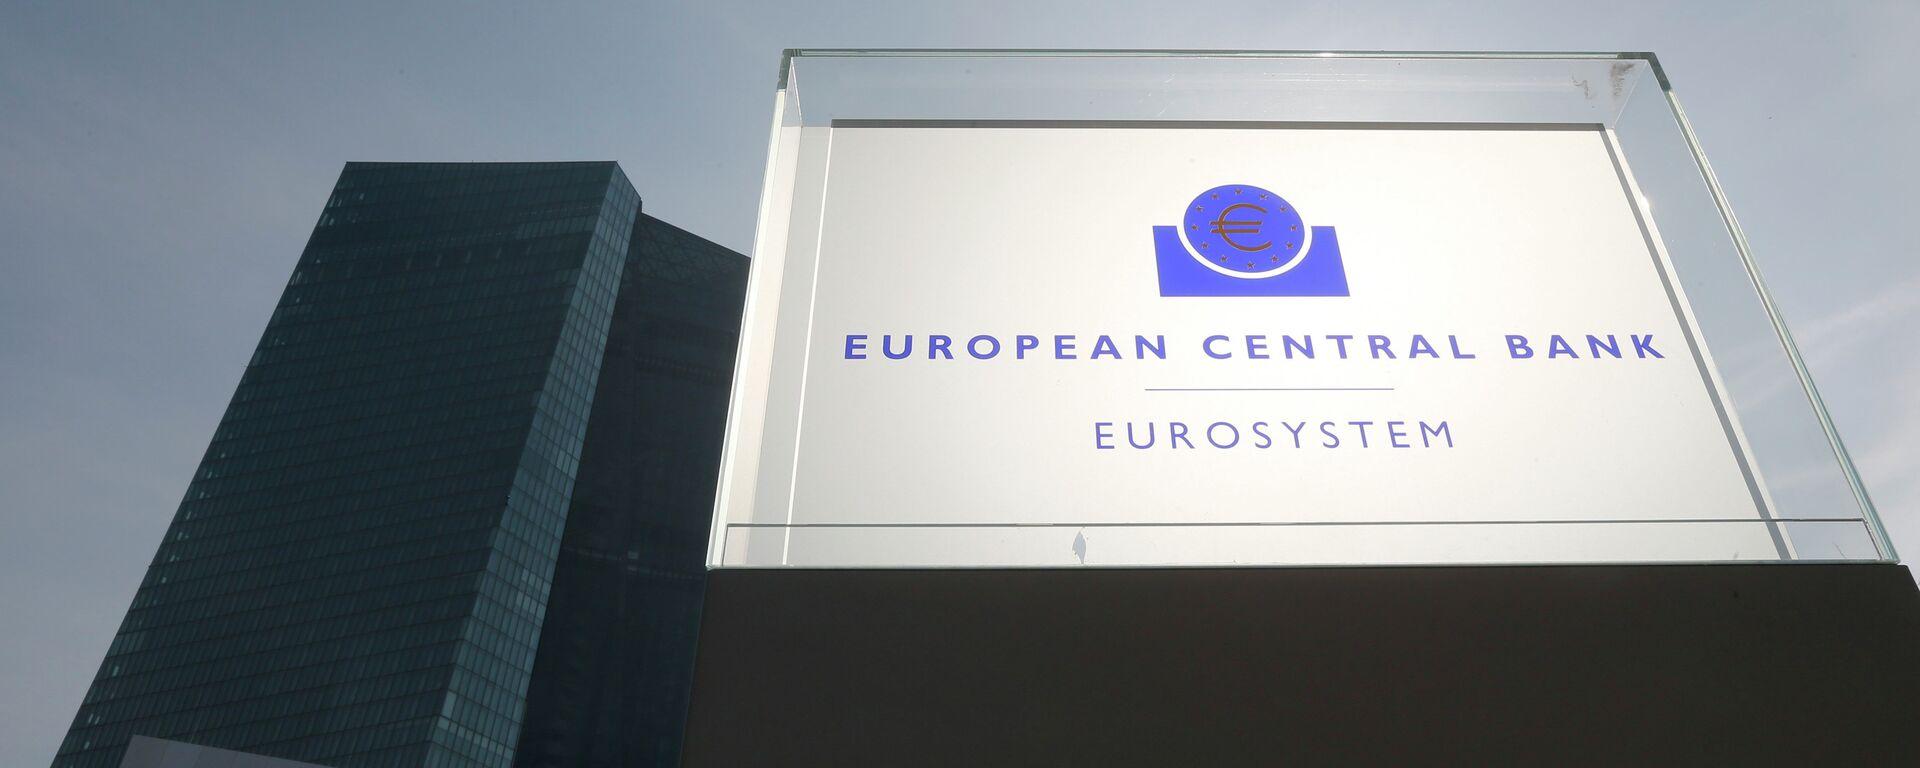 La sede dellas BCE a Francoforte - Sputnik Italia, 1920, 23.12.2020